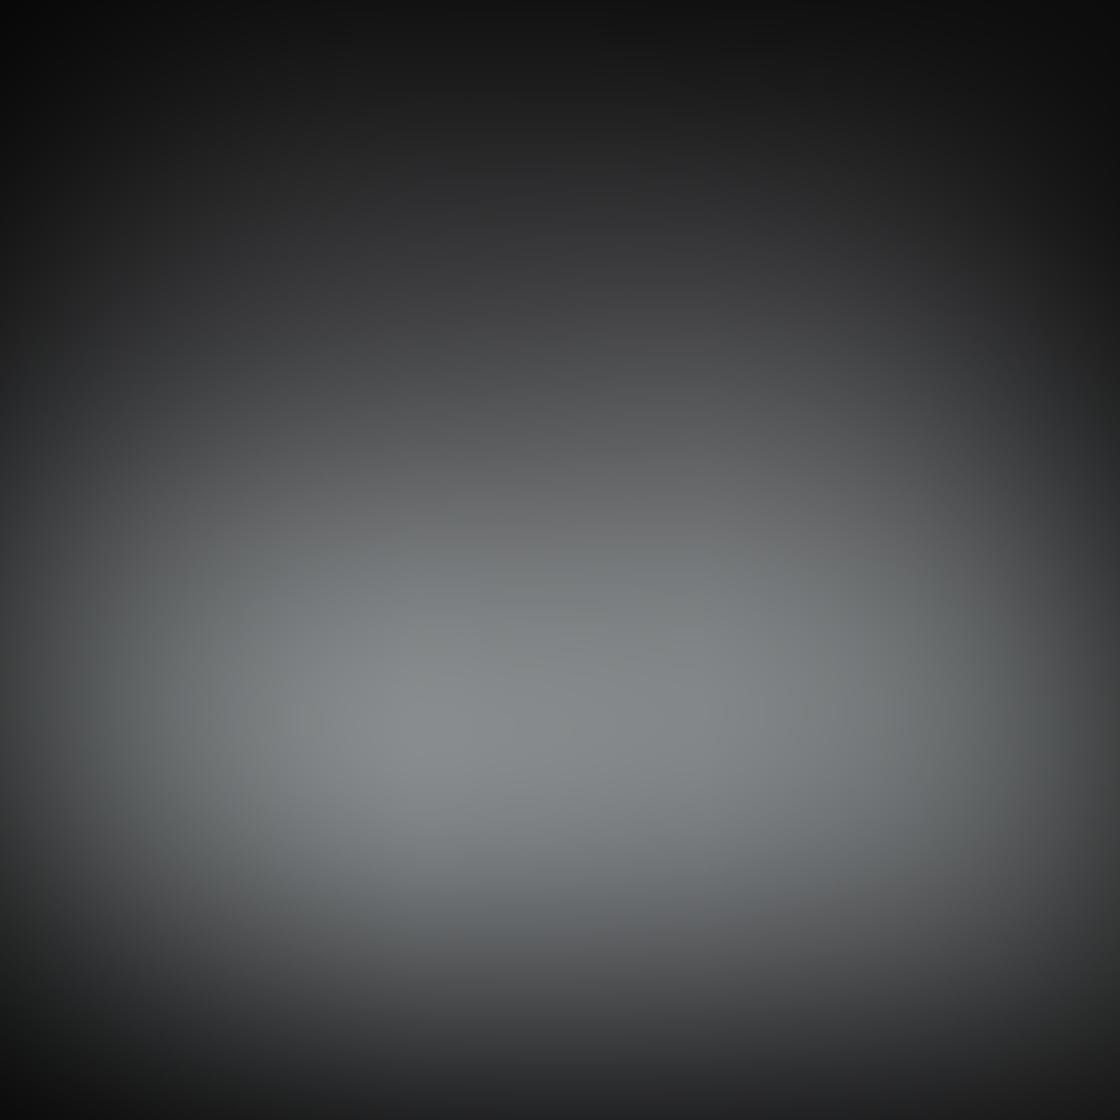 iPhone Photos Negative Space 16